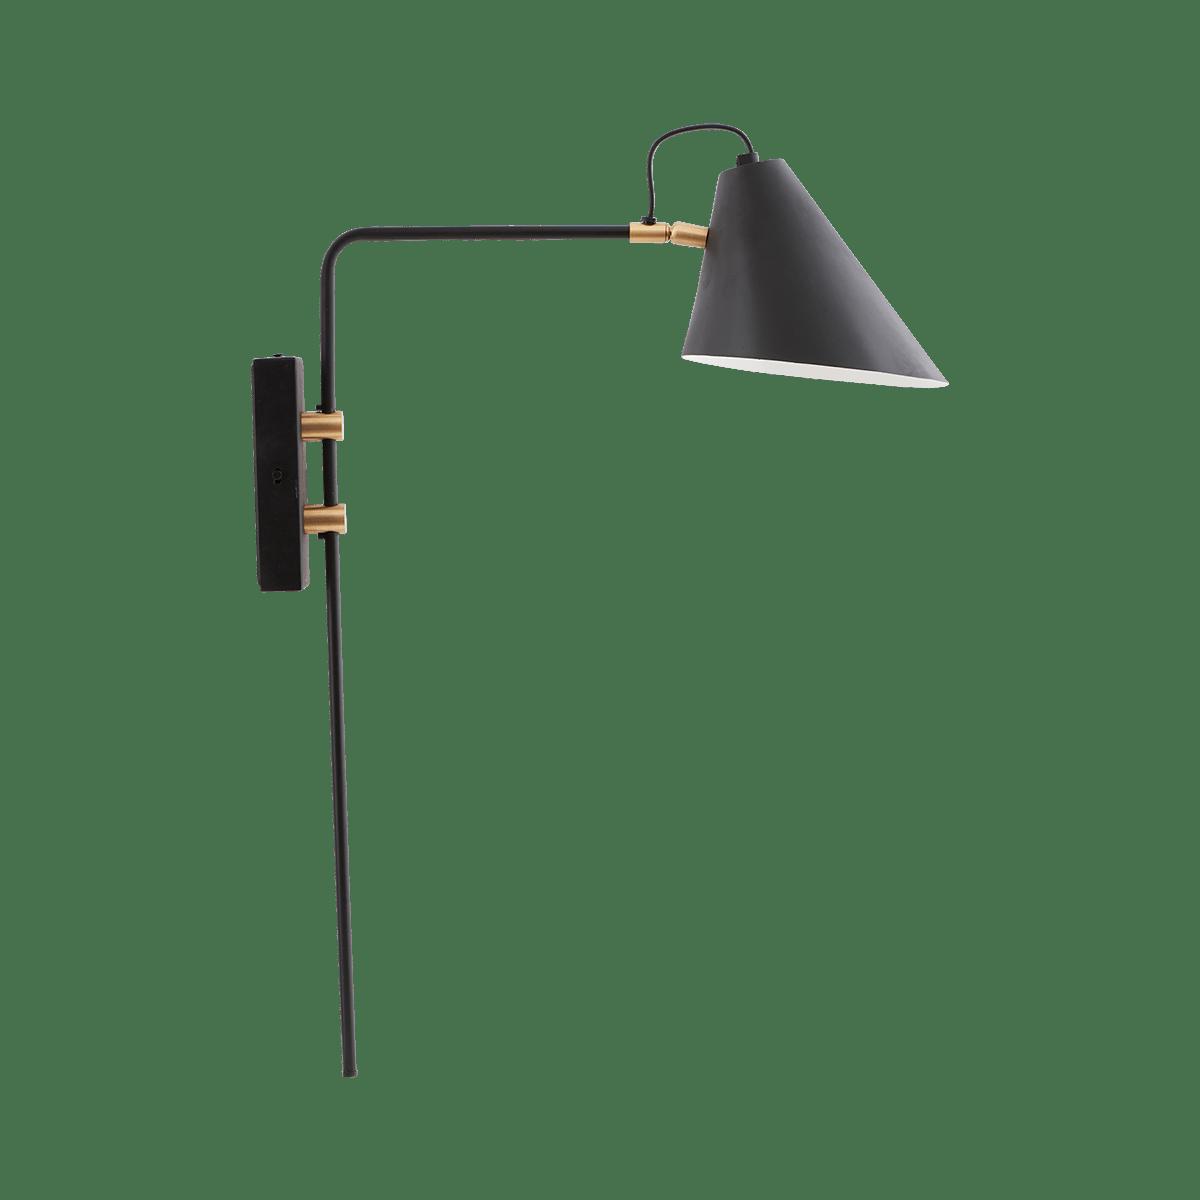 Sada 2 ks − Černá nástěnná lampa Club